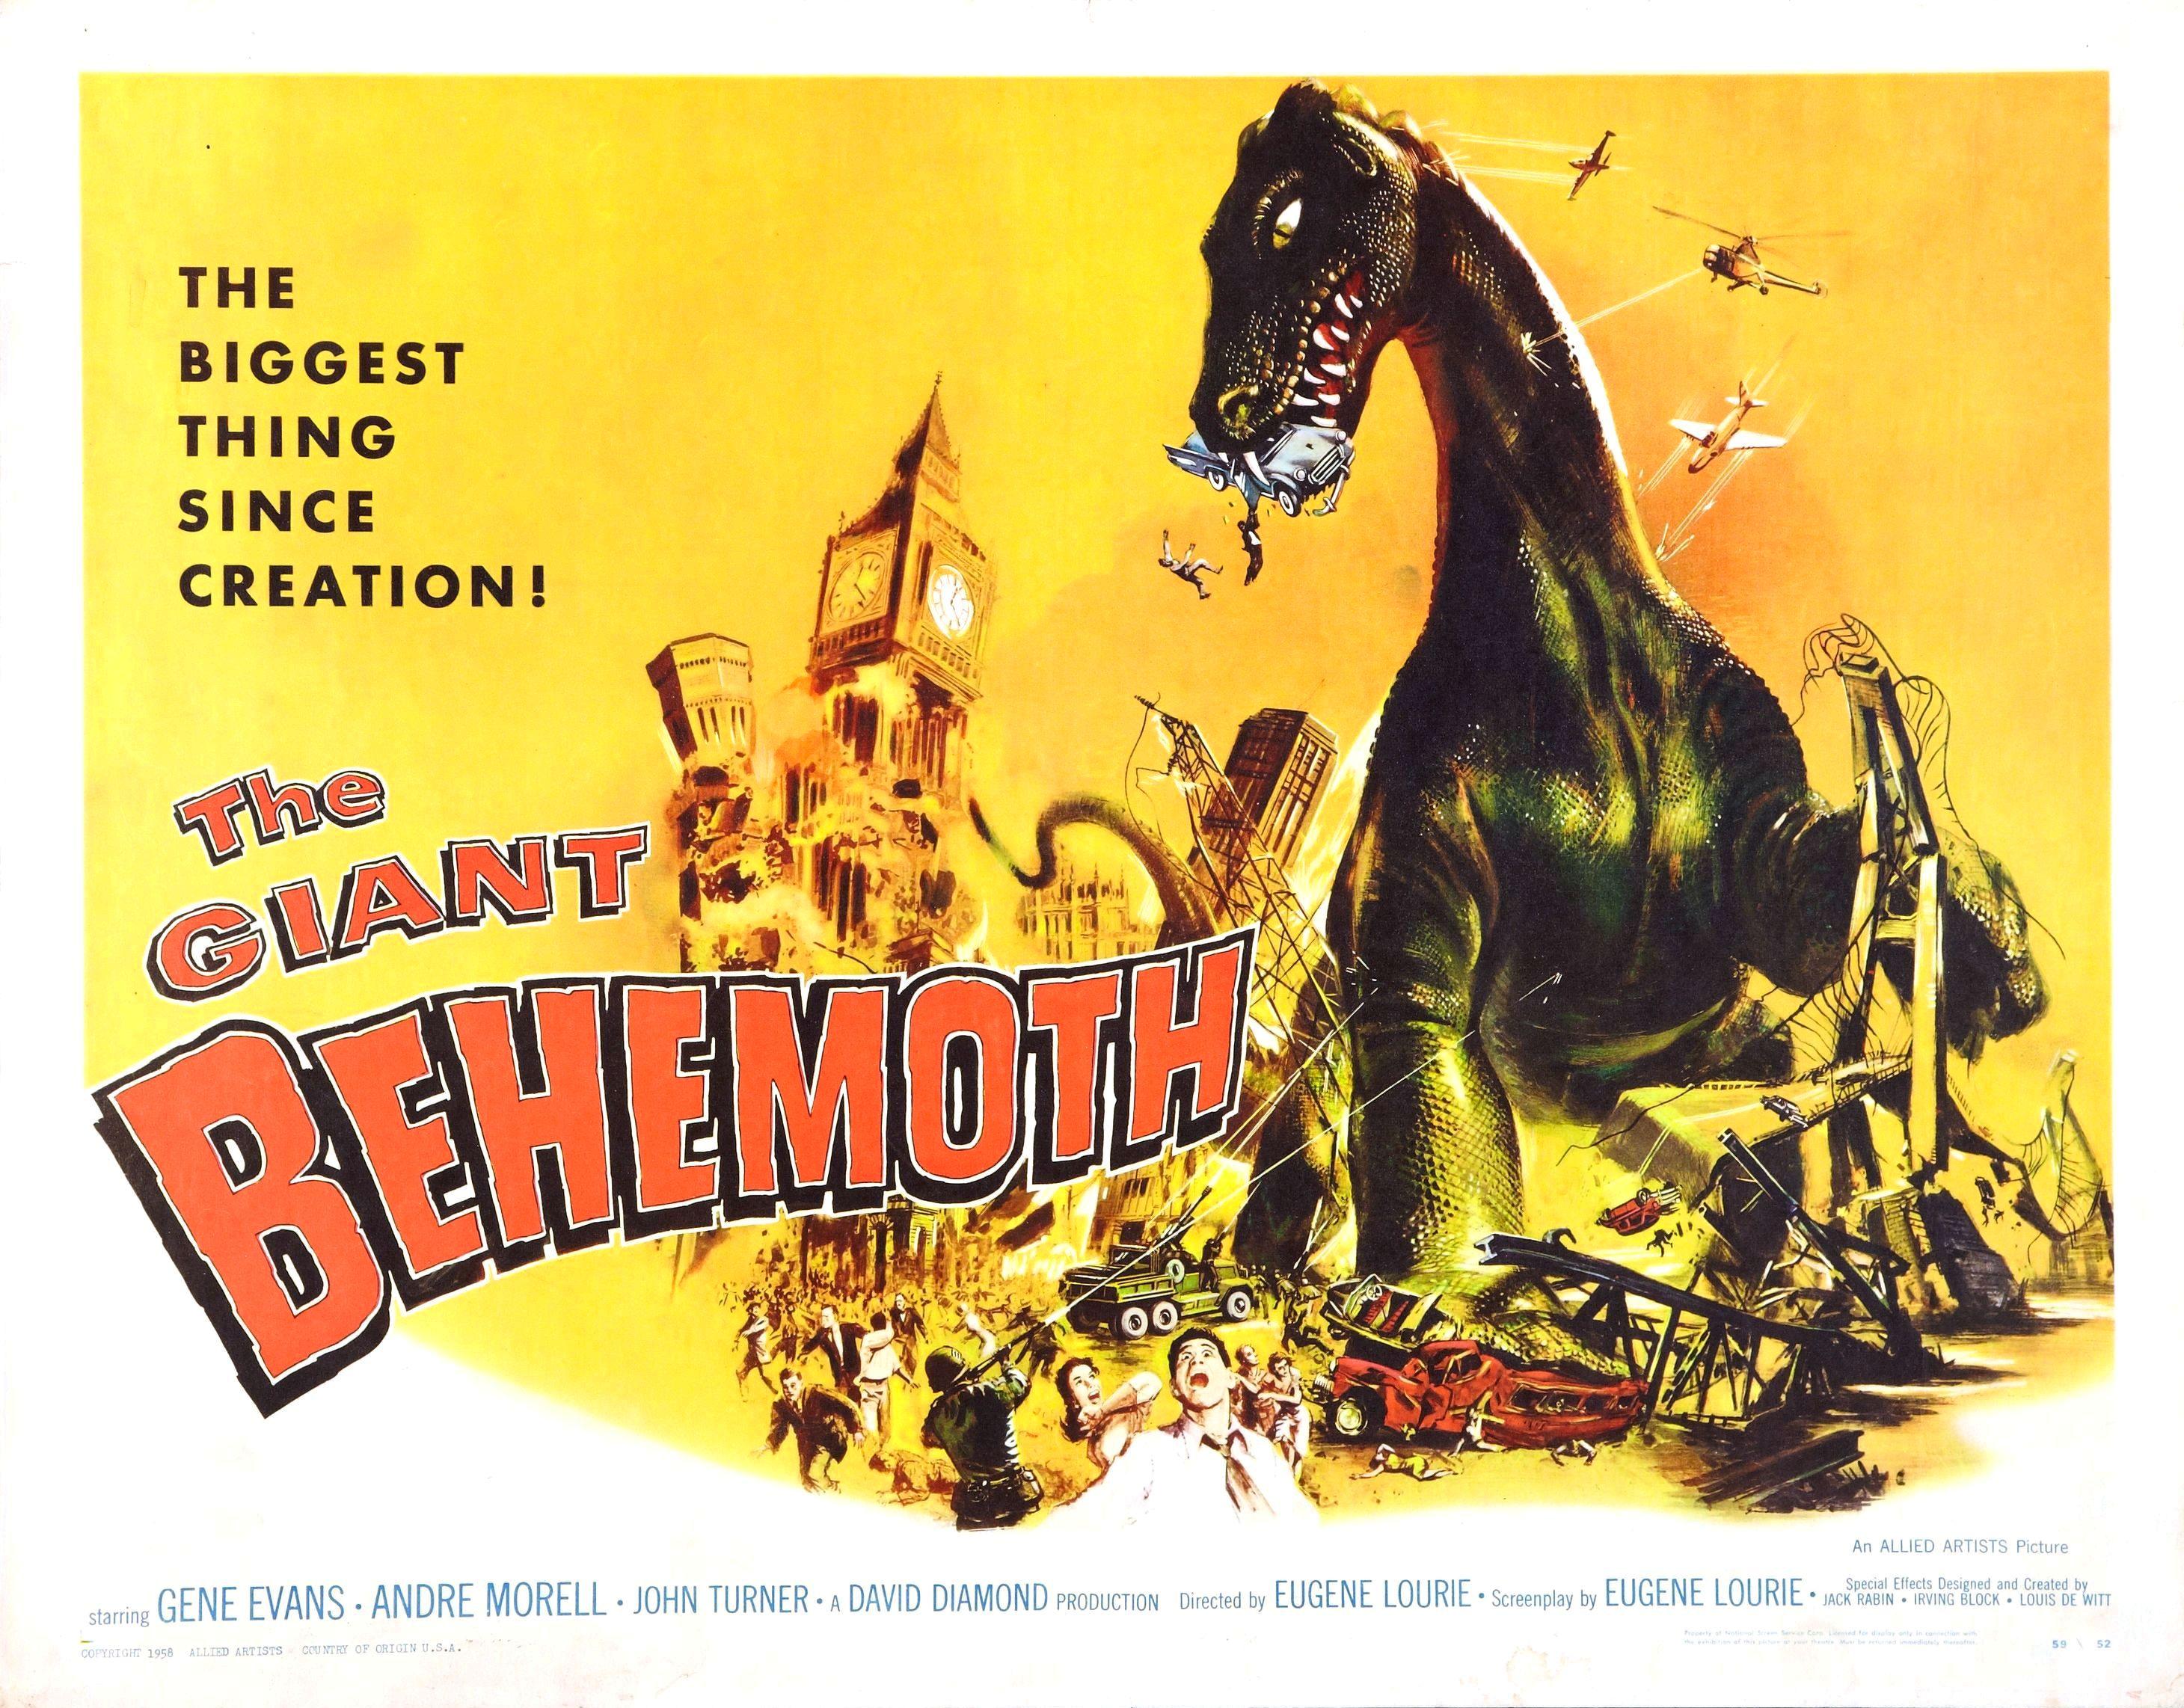 2920x2284 > Behemoth, The Sea Monster Wallpapers